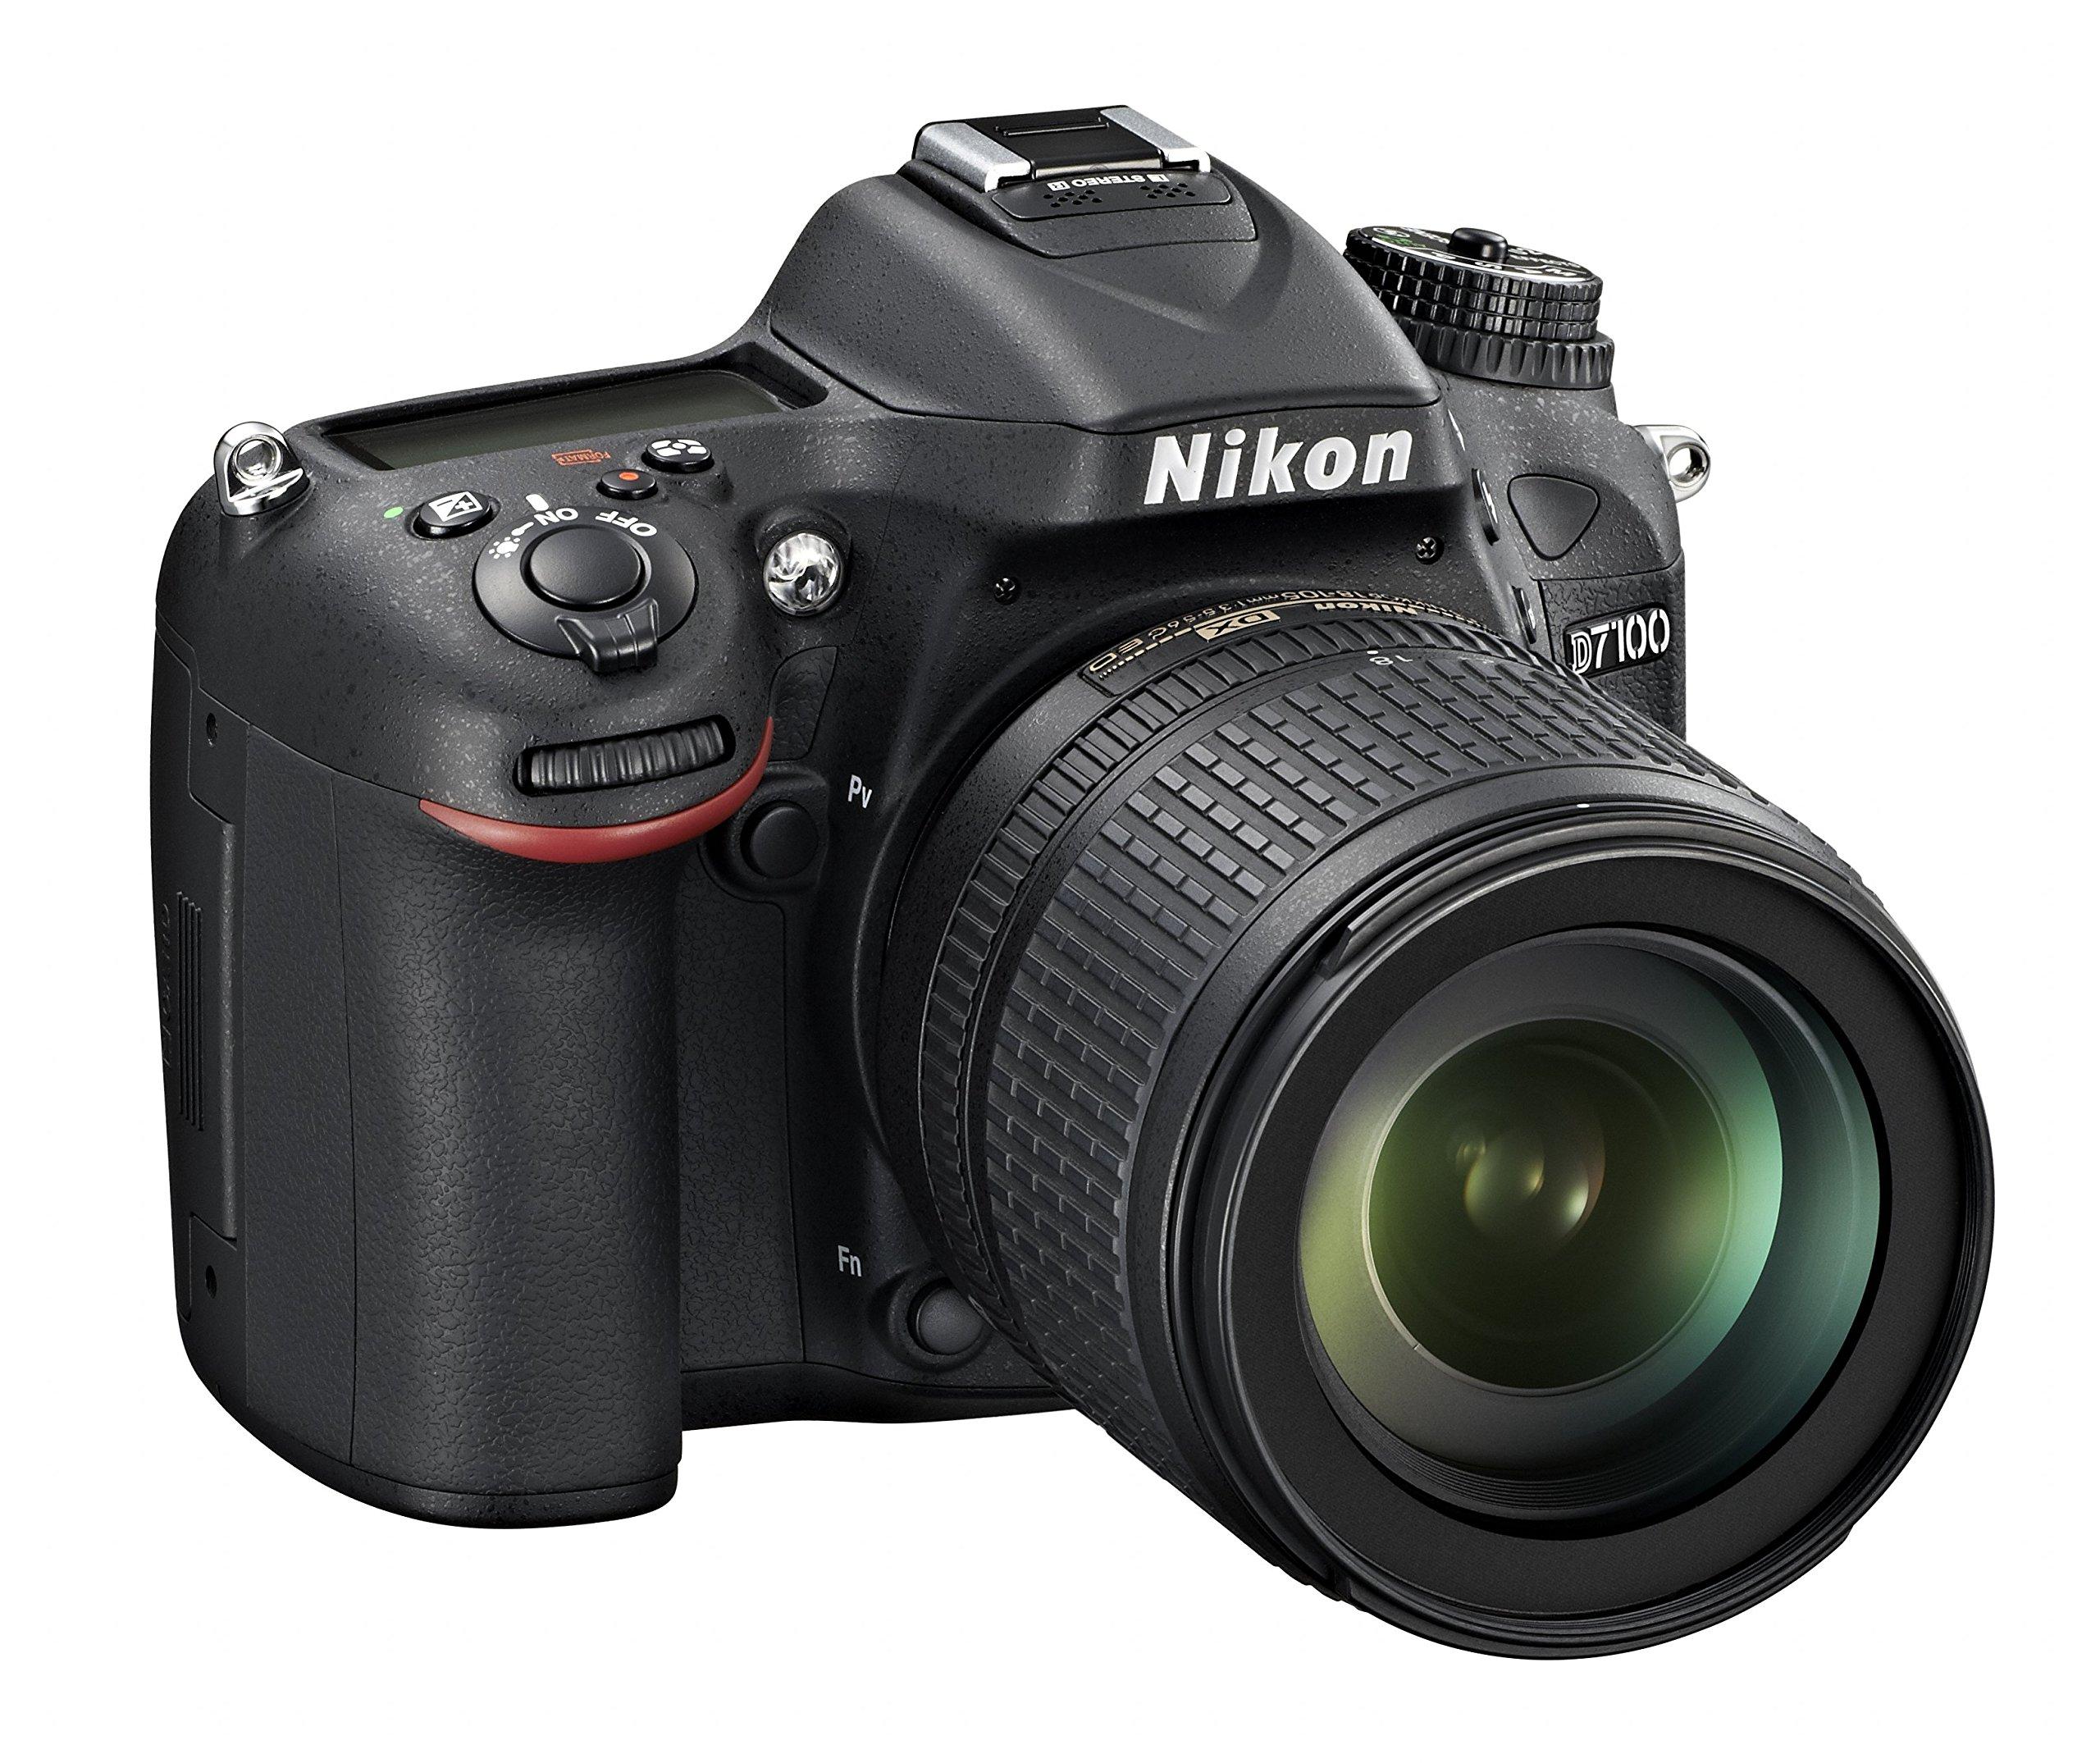 Nikon D7100 + Nikkor 18/105VR Fotocamera Reflex Digitale, 24.1 Megapixel, LCD da 3 Pollici, ISO 6400, SD 8GB Premium Lexar 180X, Colore Nero [Nital card: 4 anni di garanzia] product image